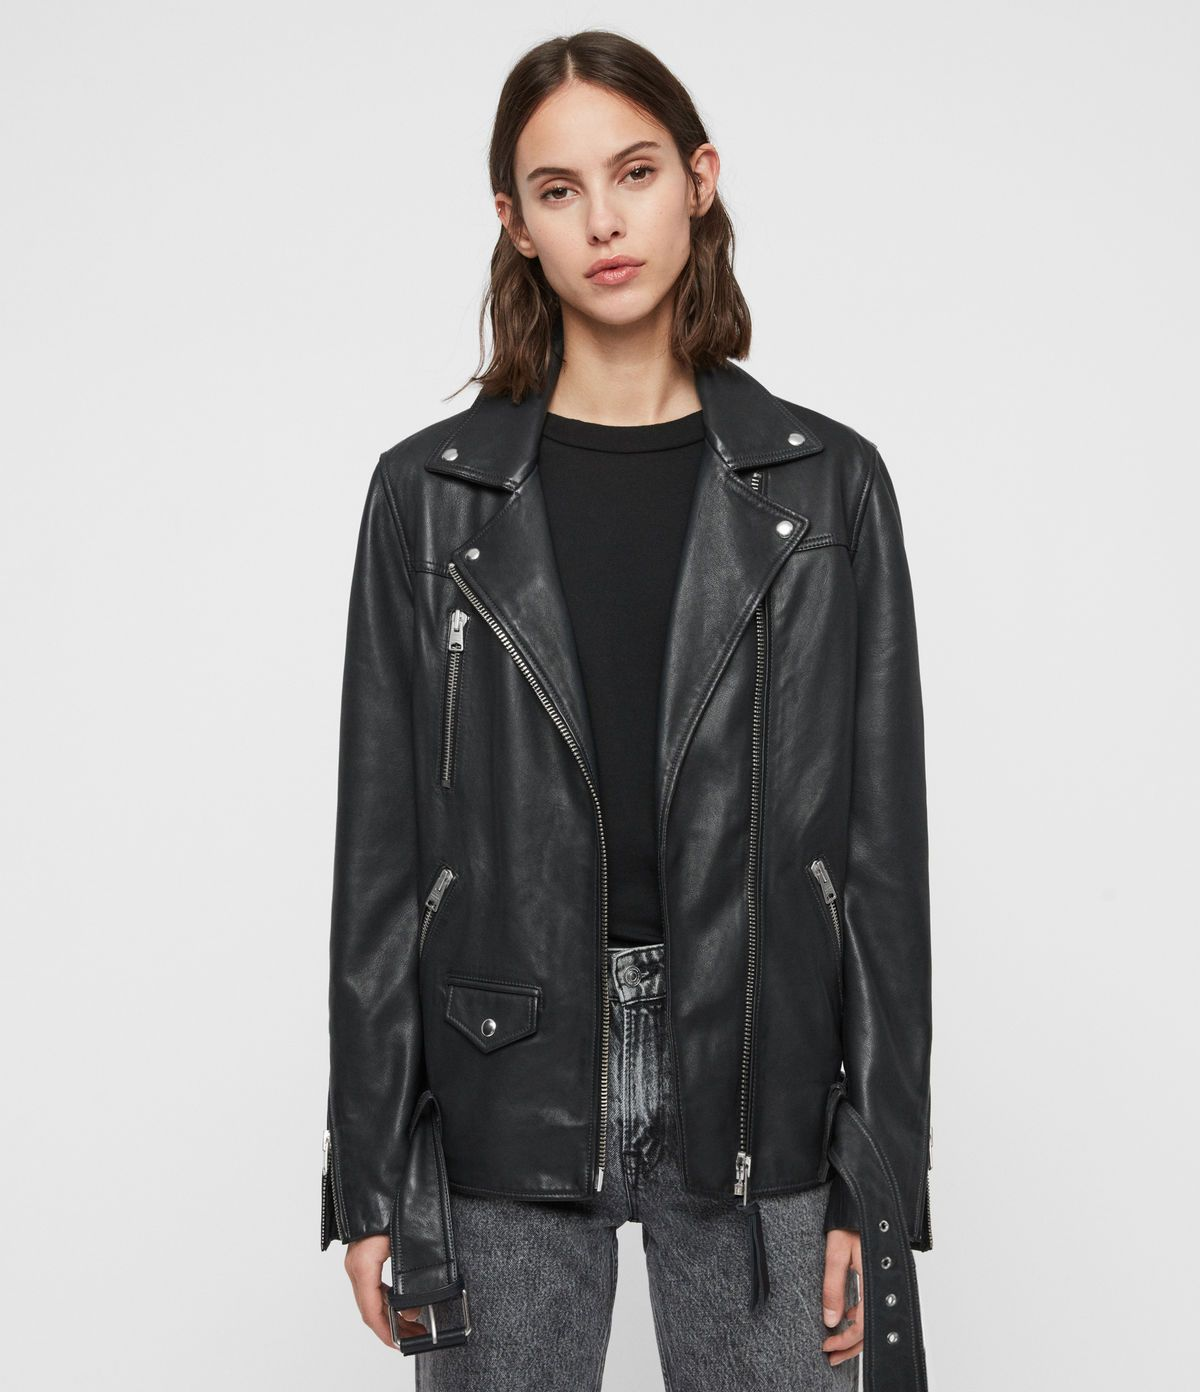 Allsaints Us Womens Eline Oversized Leather Biker Jacket Black Leather Jackets Women Leather Jacket Zara Leather Jacket [ 1392 x 1200 Pixel ]